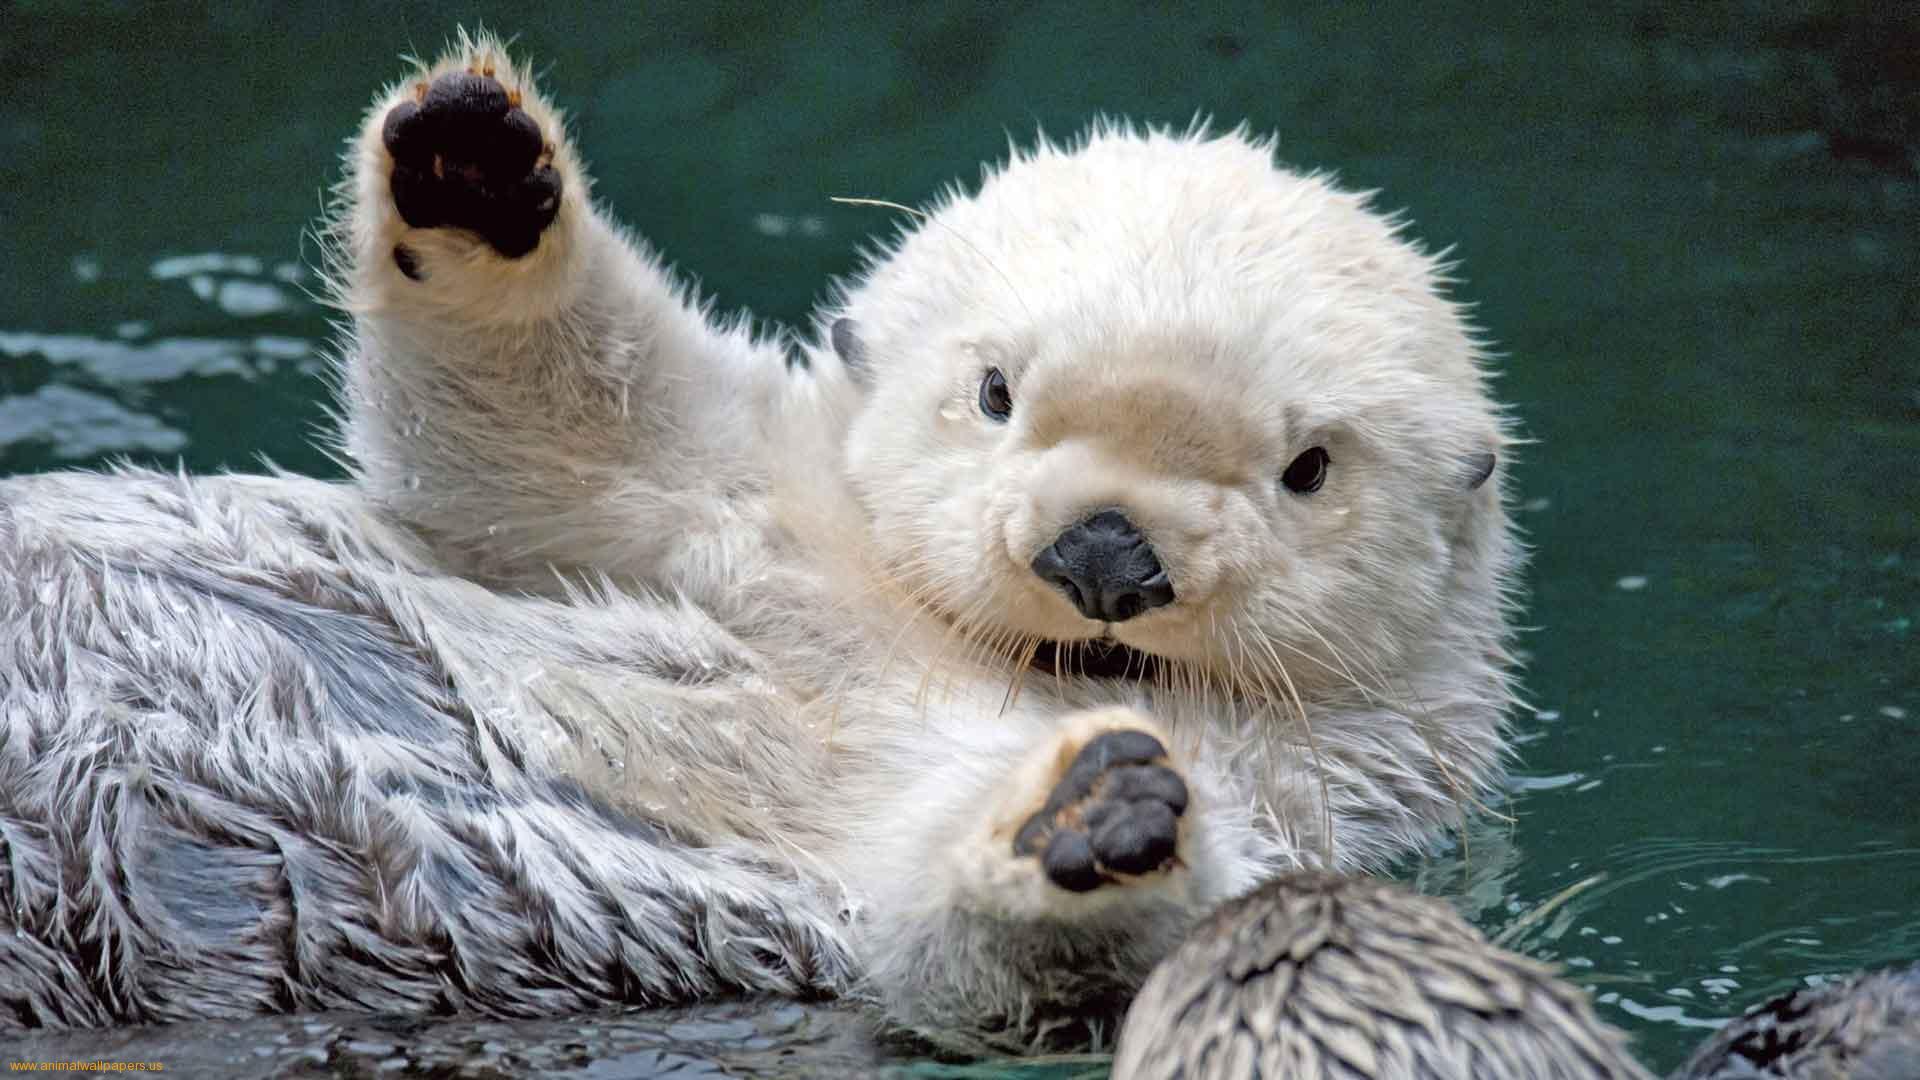 Cute Baby Sea Otters Wallpaper 1920x1080 Full HD Wallpapers 1920x1080